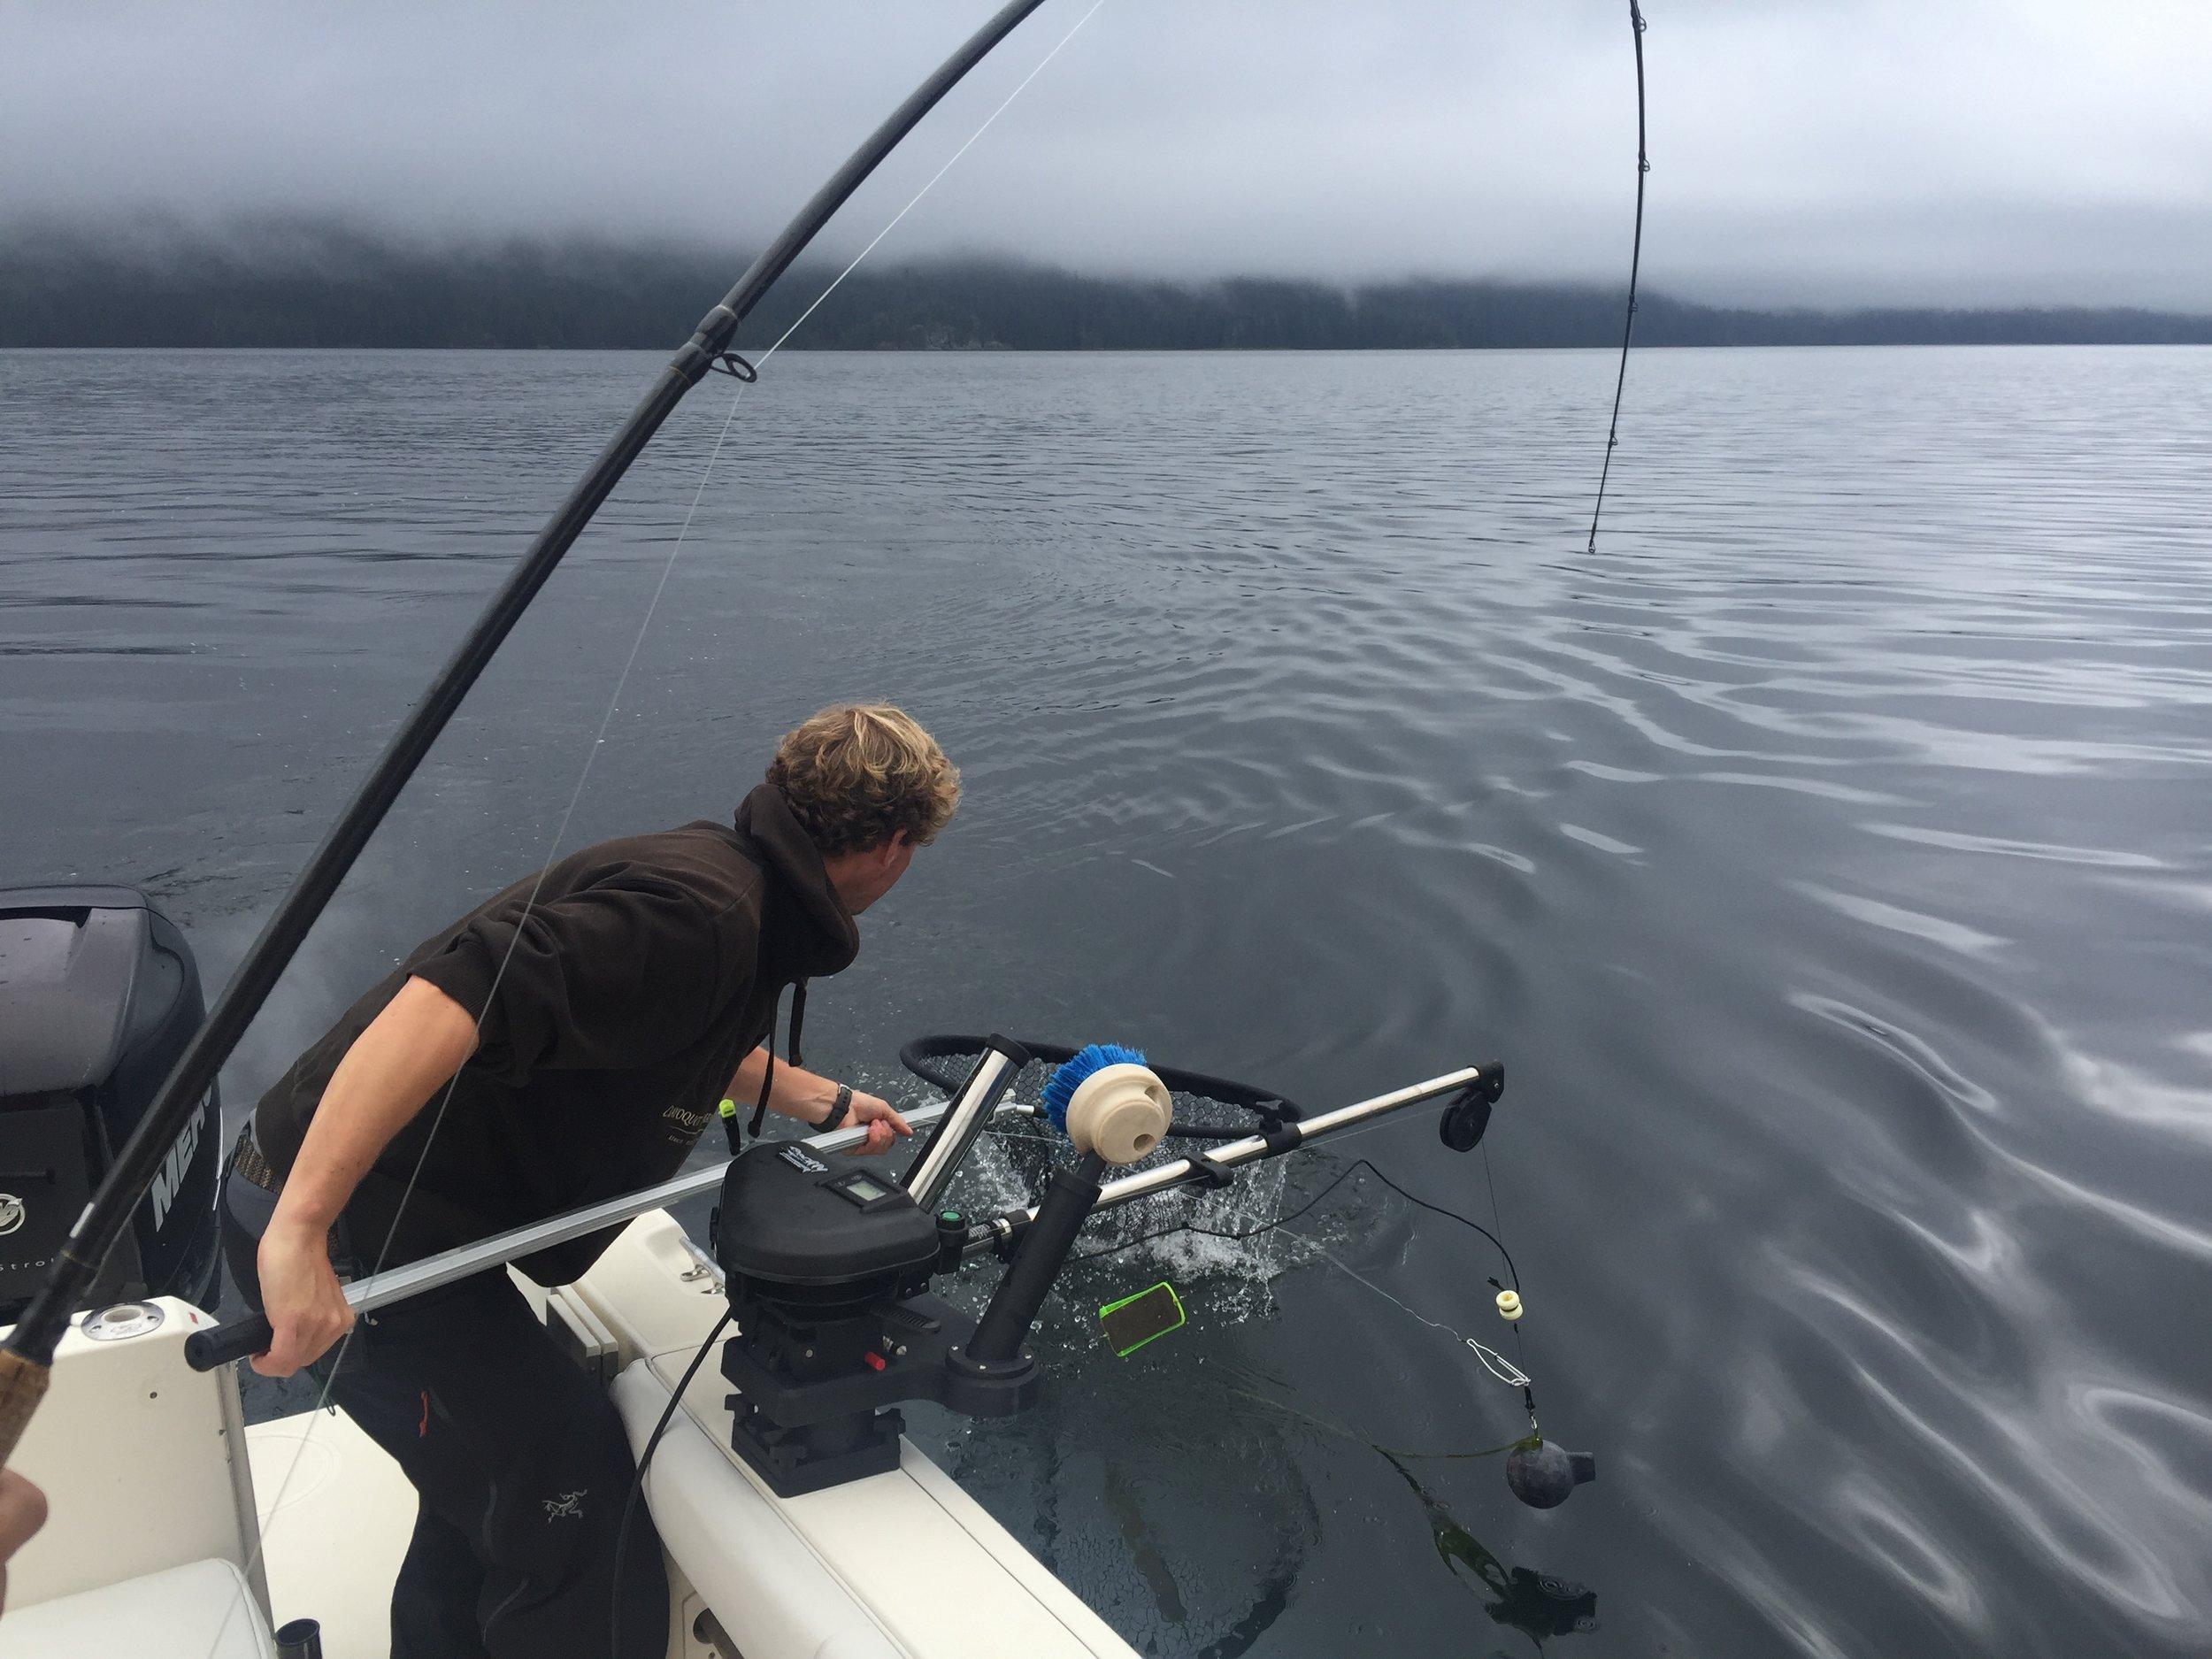 Salmon Fishing. Or rockfish fishing. - Source Claudia Laroye